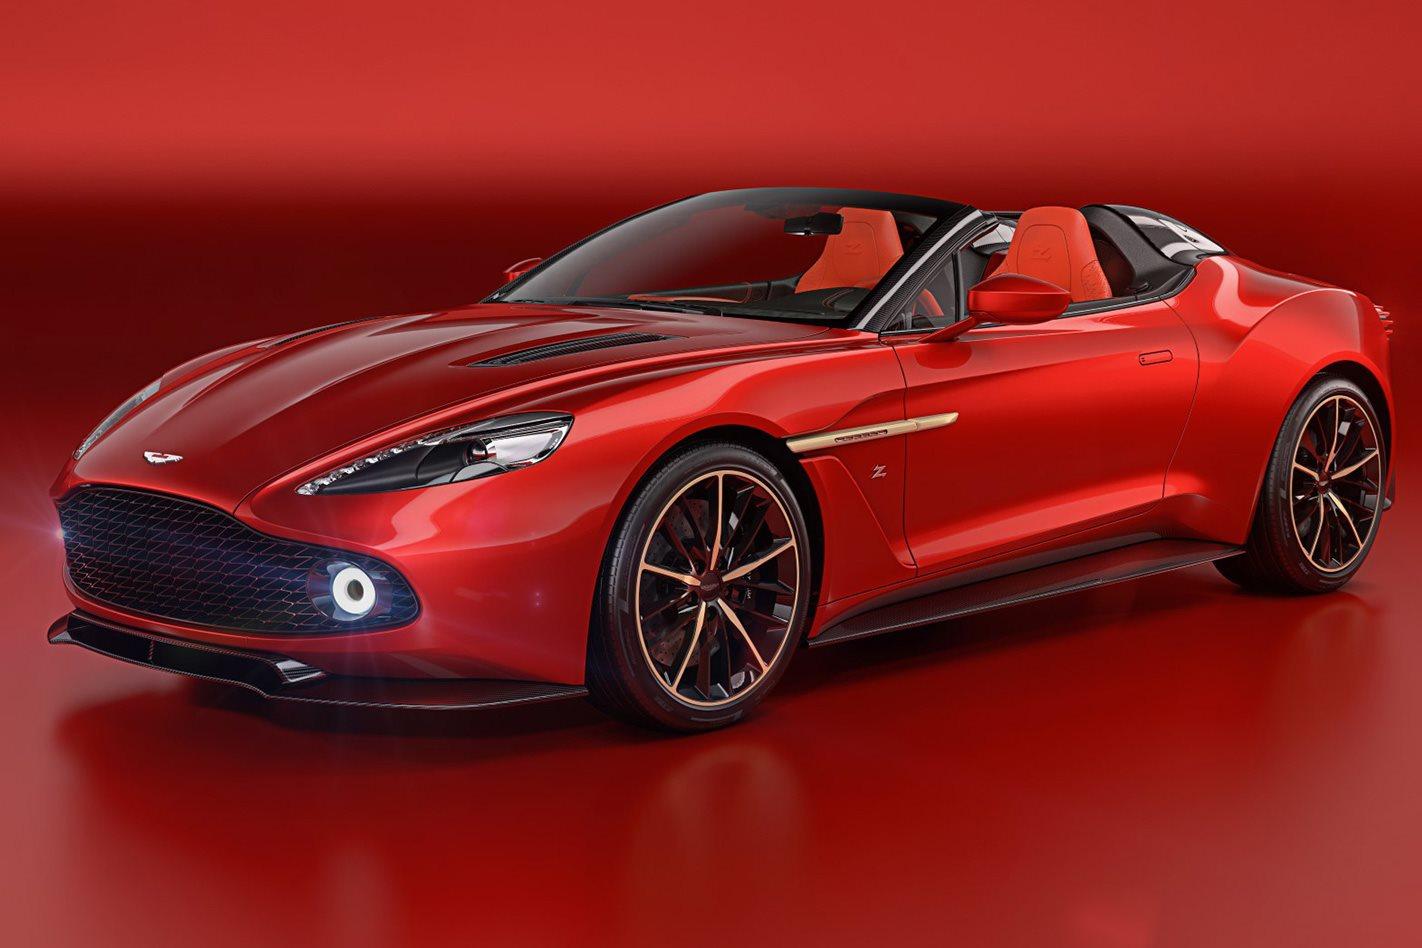 Aston Martin Vanquish Zagato Speedster front